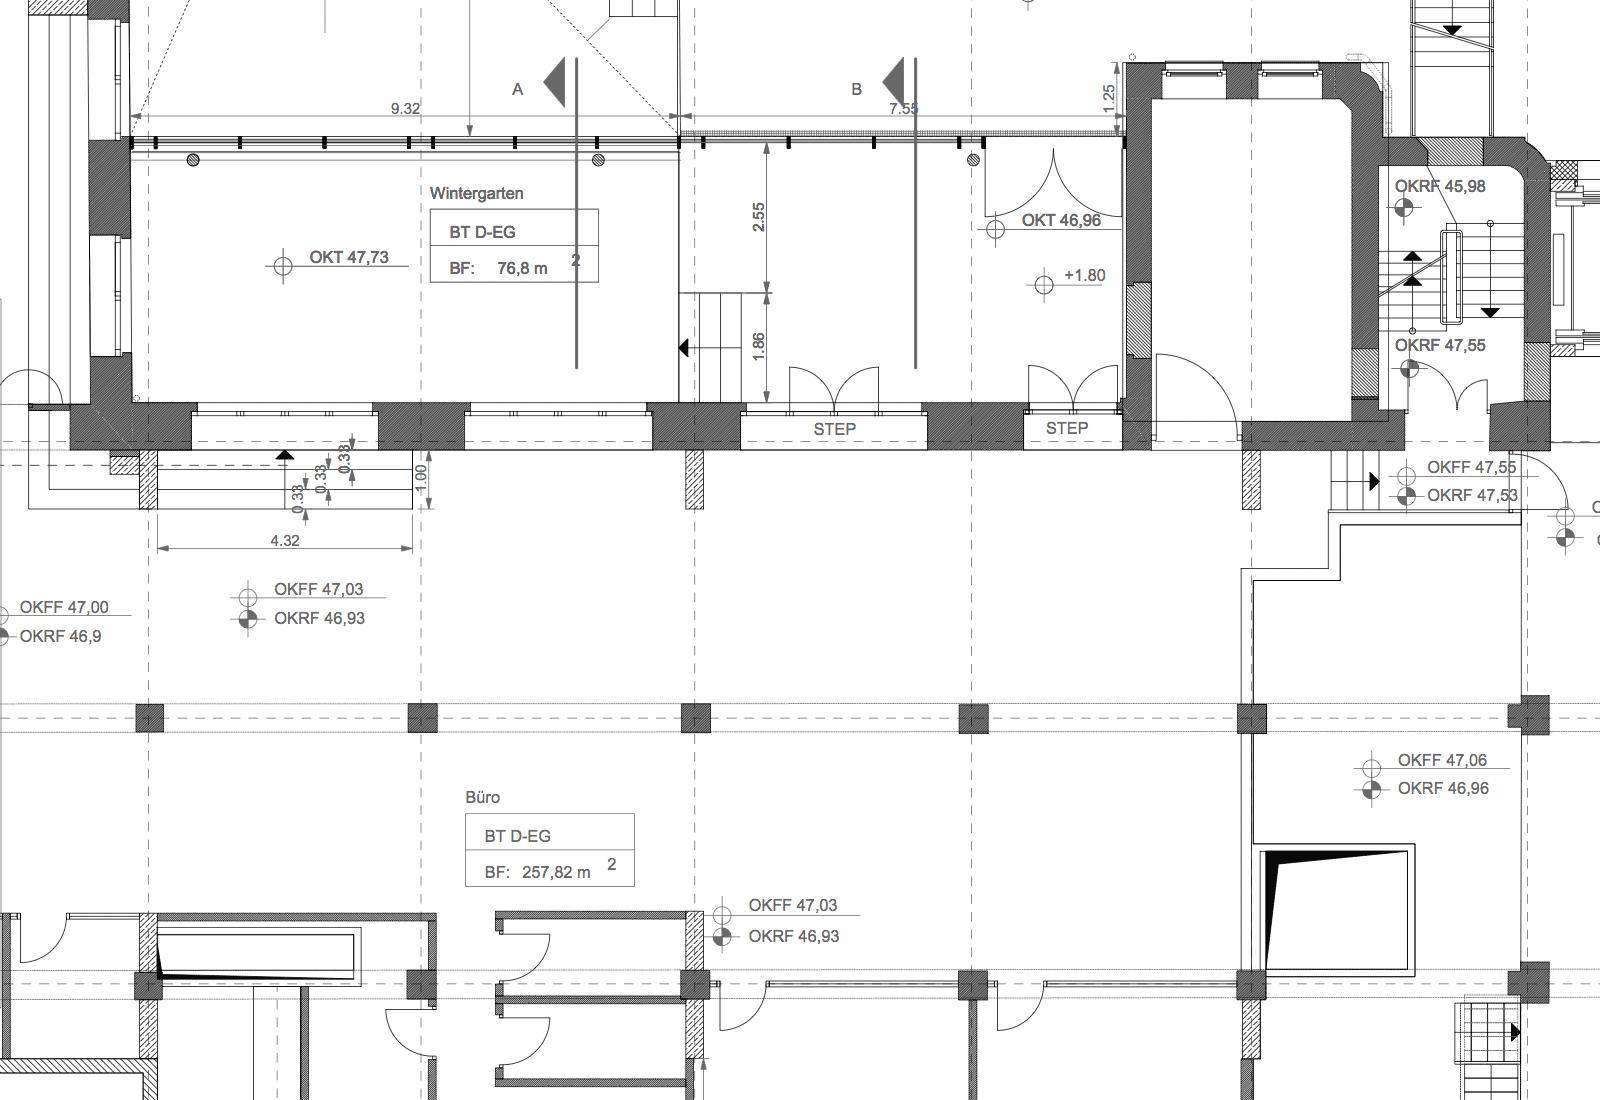 140527-Factory-Berlin-Julian-Breinersdorfer-Architekt-Entwurfsplanung-EG.png